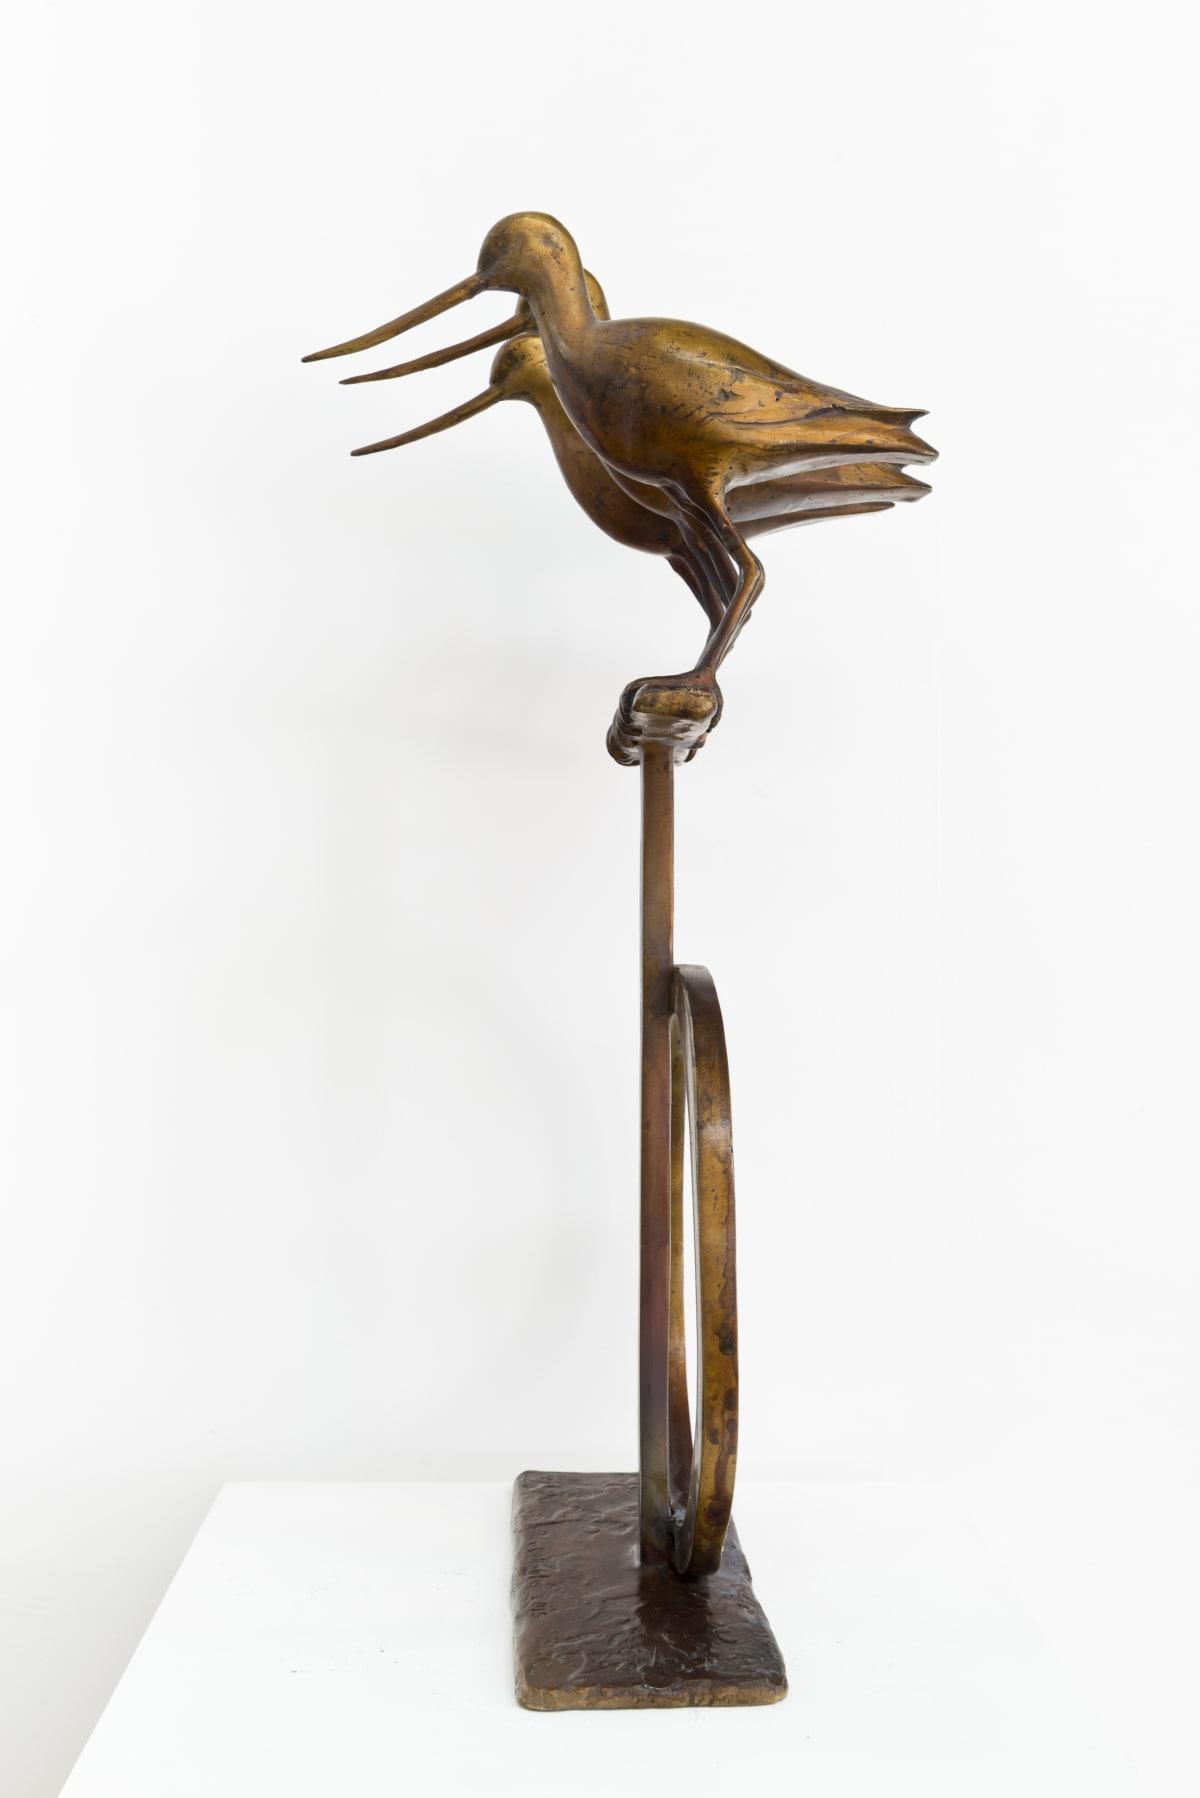 Paul DIBBLE The Godwits Arrive, 2014 Cast Patinated Bronze 25.2 x 13 x 9.8 in 64 x 33 x 25 cm #1/2